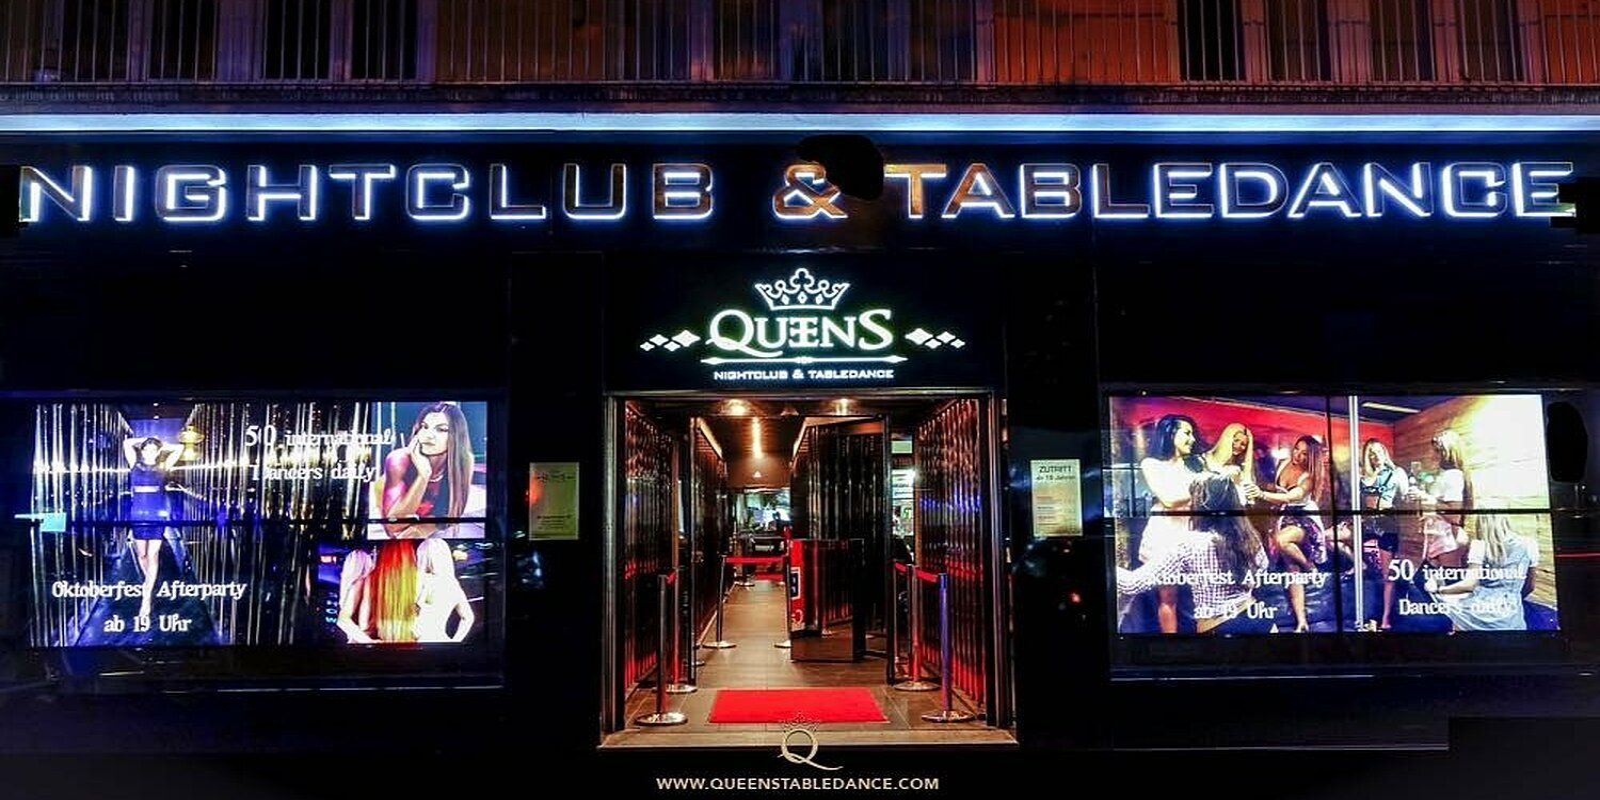 Queens Nightclub&Tabledance, Goethestr., Ludwigsvorstadt